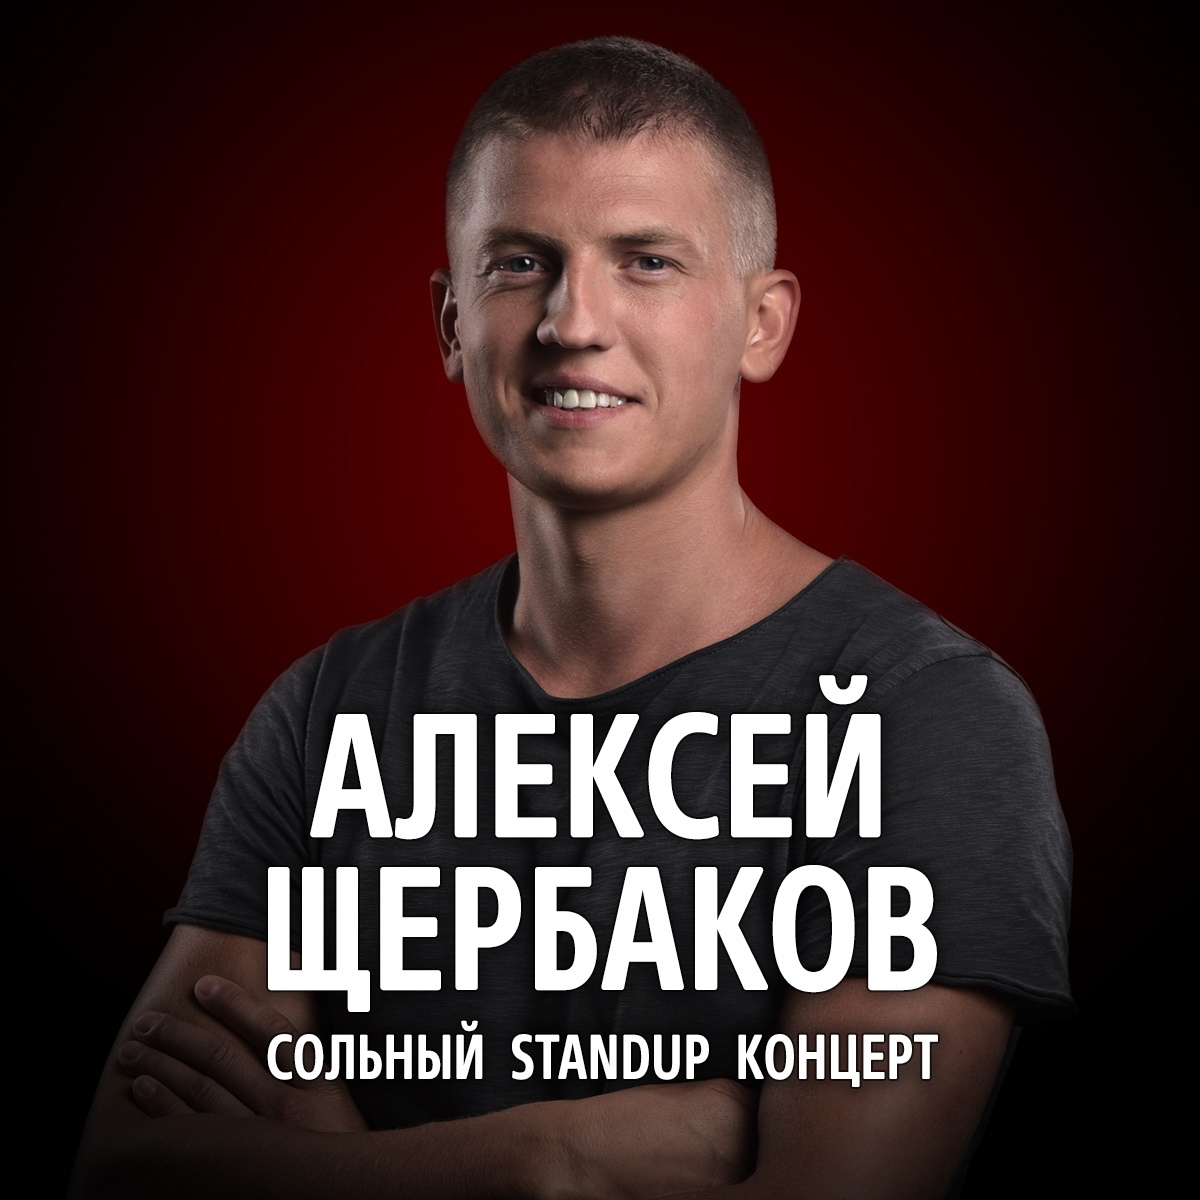 Афиша Тула Алексей Щербаков Тула 15.06, 19:00